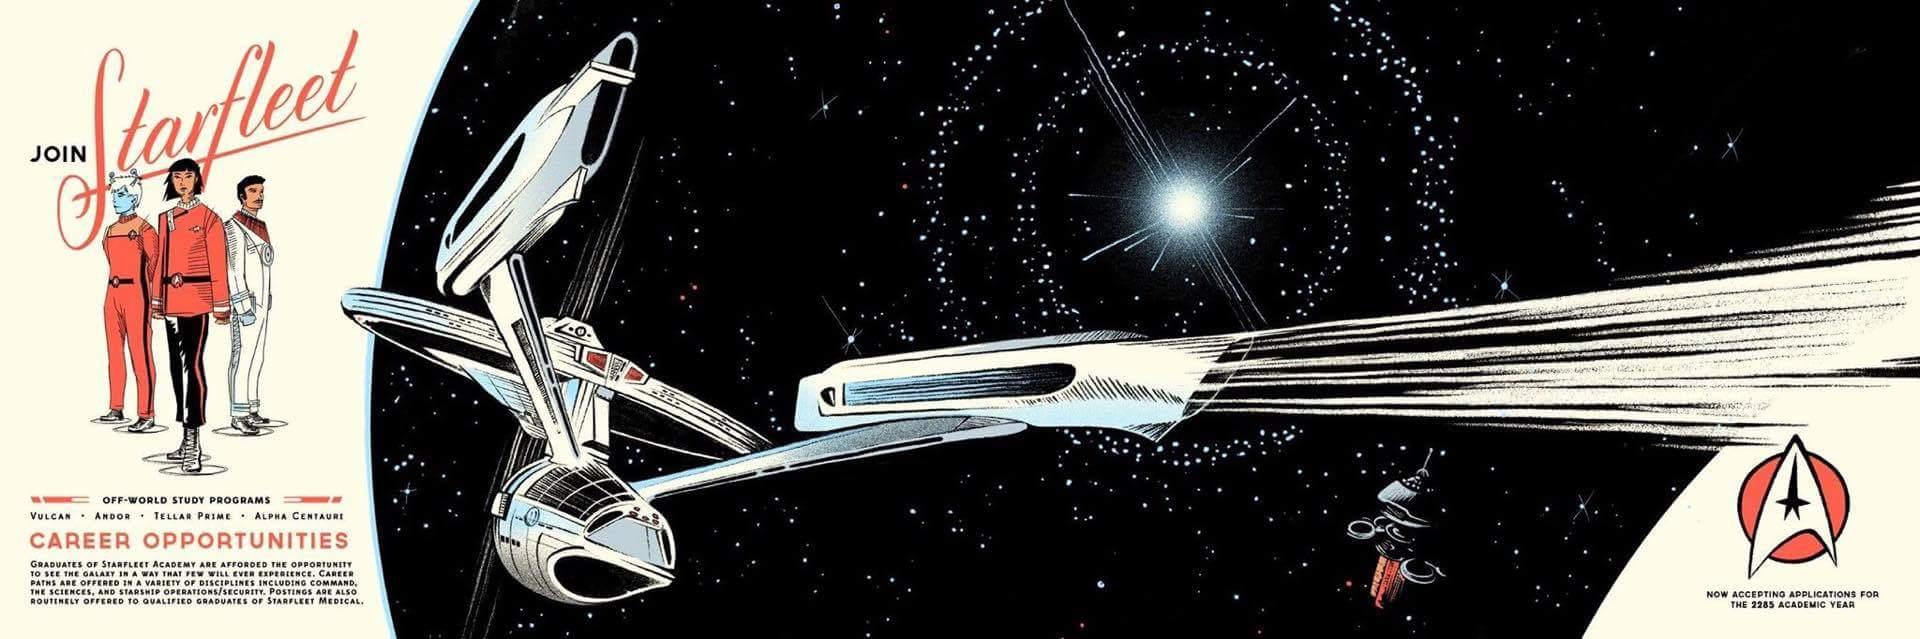 Wooden Starfleet reg